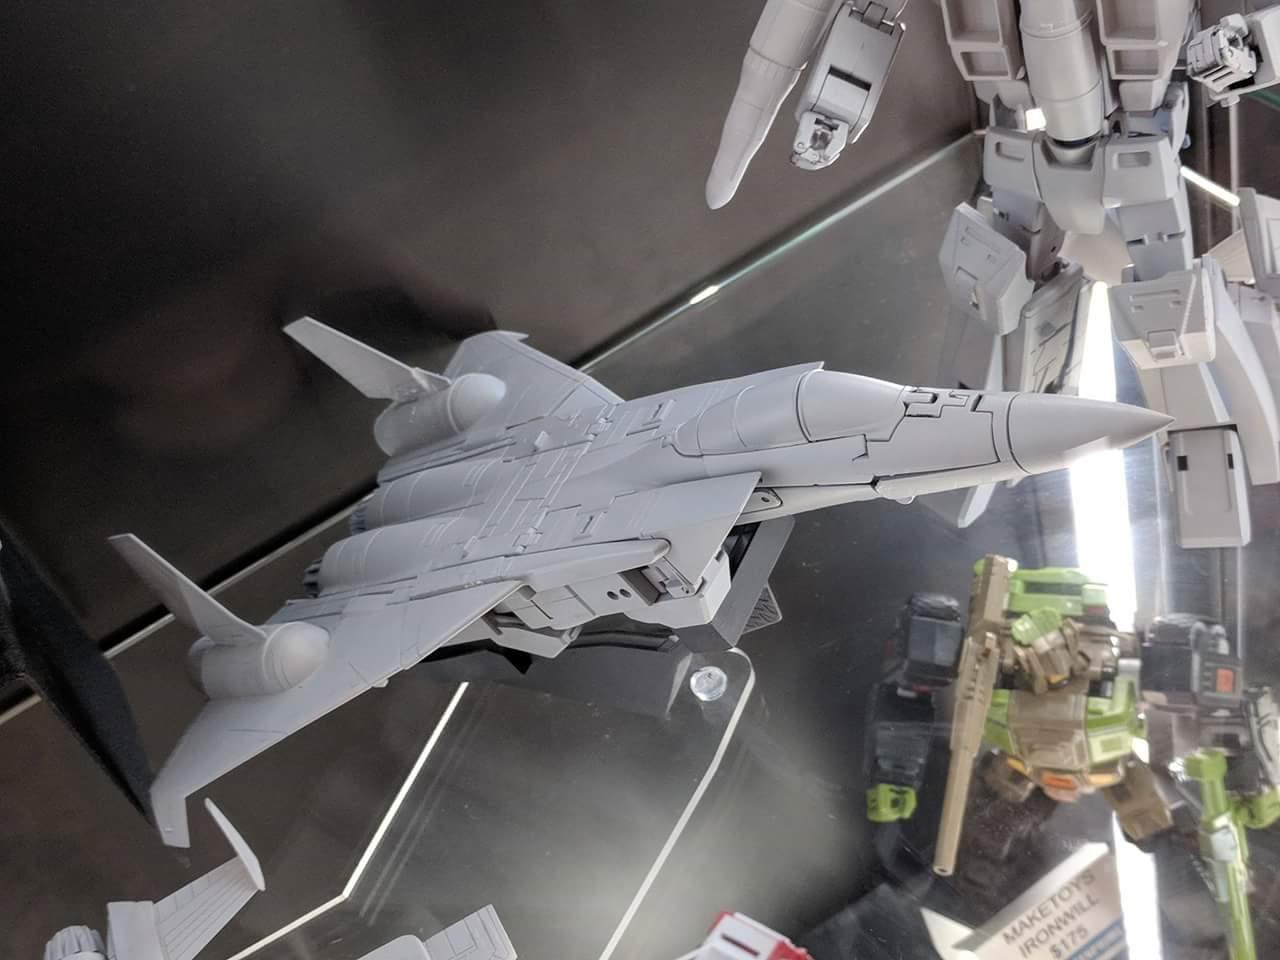 [Maketoys] Produit Tiers - Jouets MTRM-15 Endgame (aka Dirge/Funébro), MTRM-16 Jetstream (aka Thrust/Fatalo) & MTRM-17 Booster (aka Ramjet/Statoréacto) CWDaTzmK_o